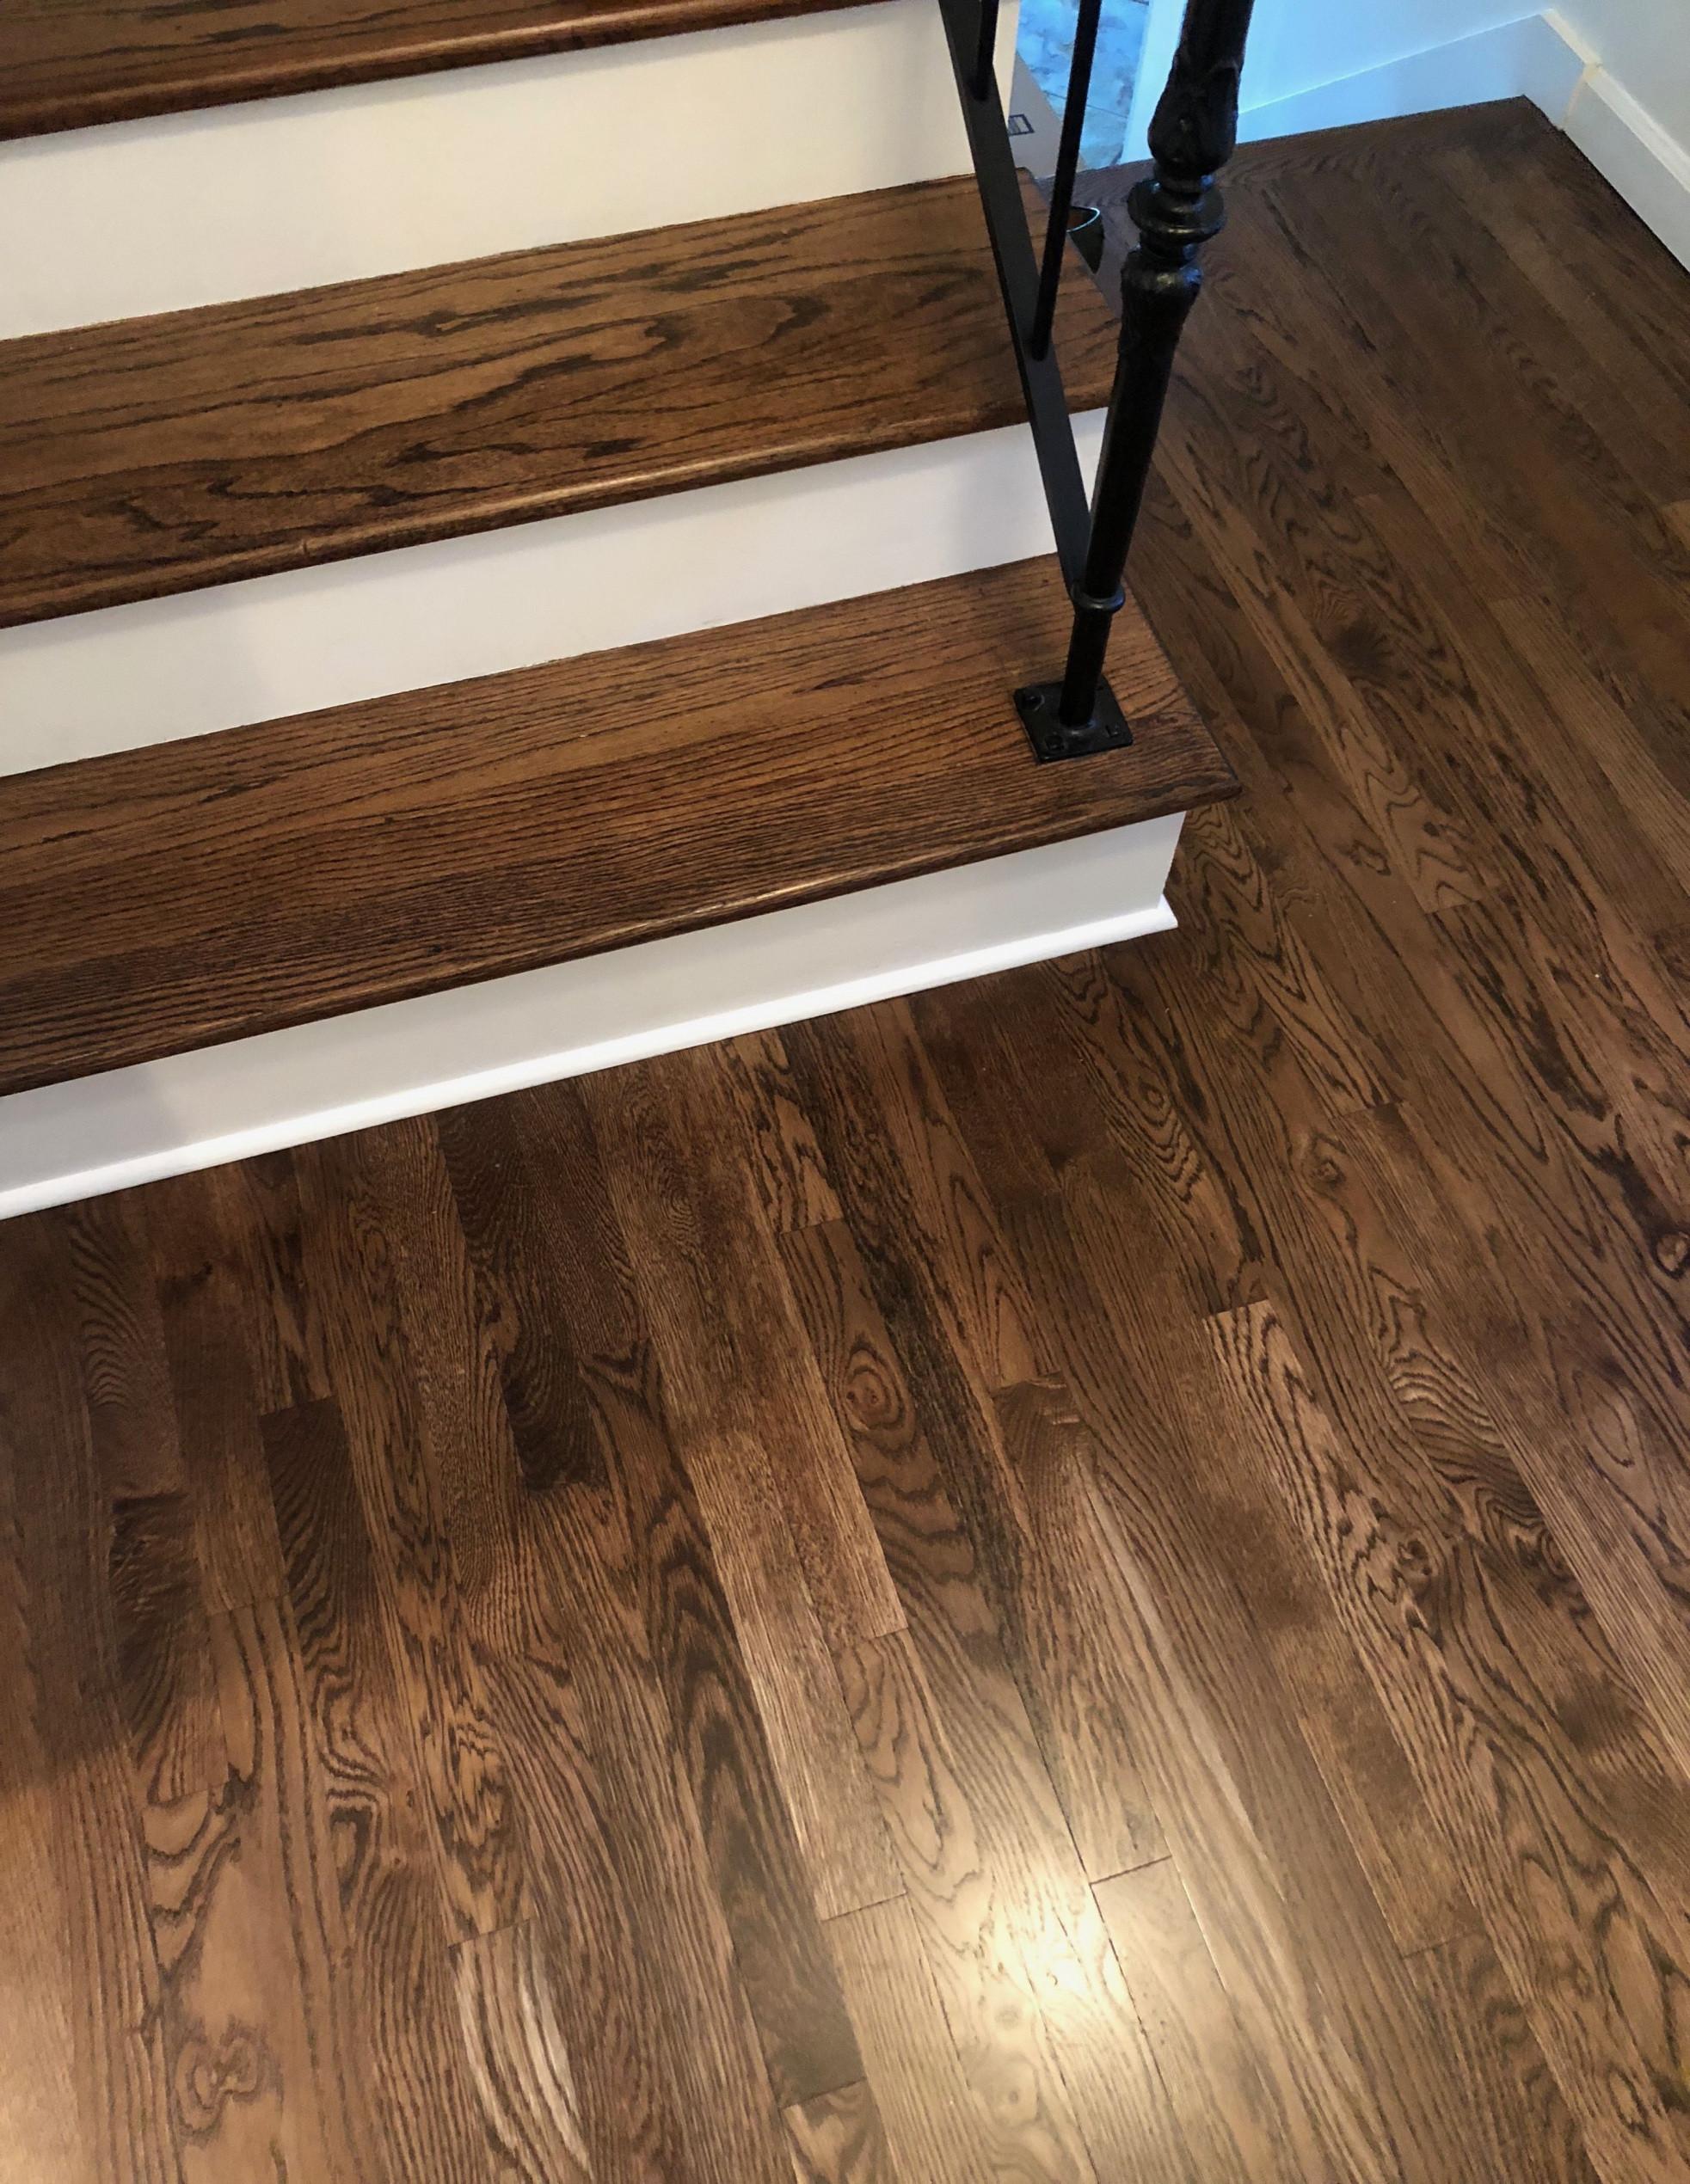 walnut hardwood flooring cost of wood floor finishes vykup hodinek info with wood floor finishes duraseal dark walnut with satin finish floors are select white oak